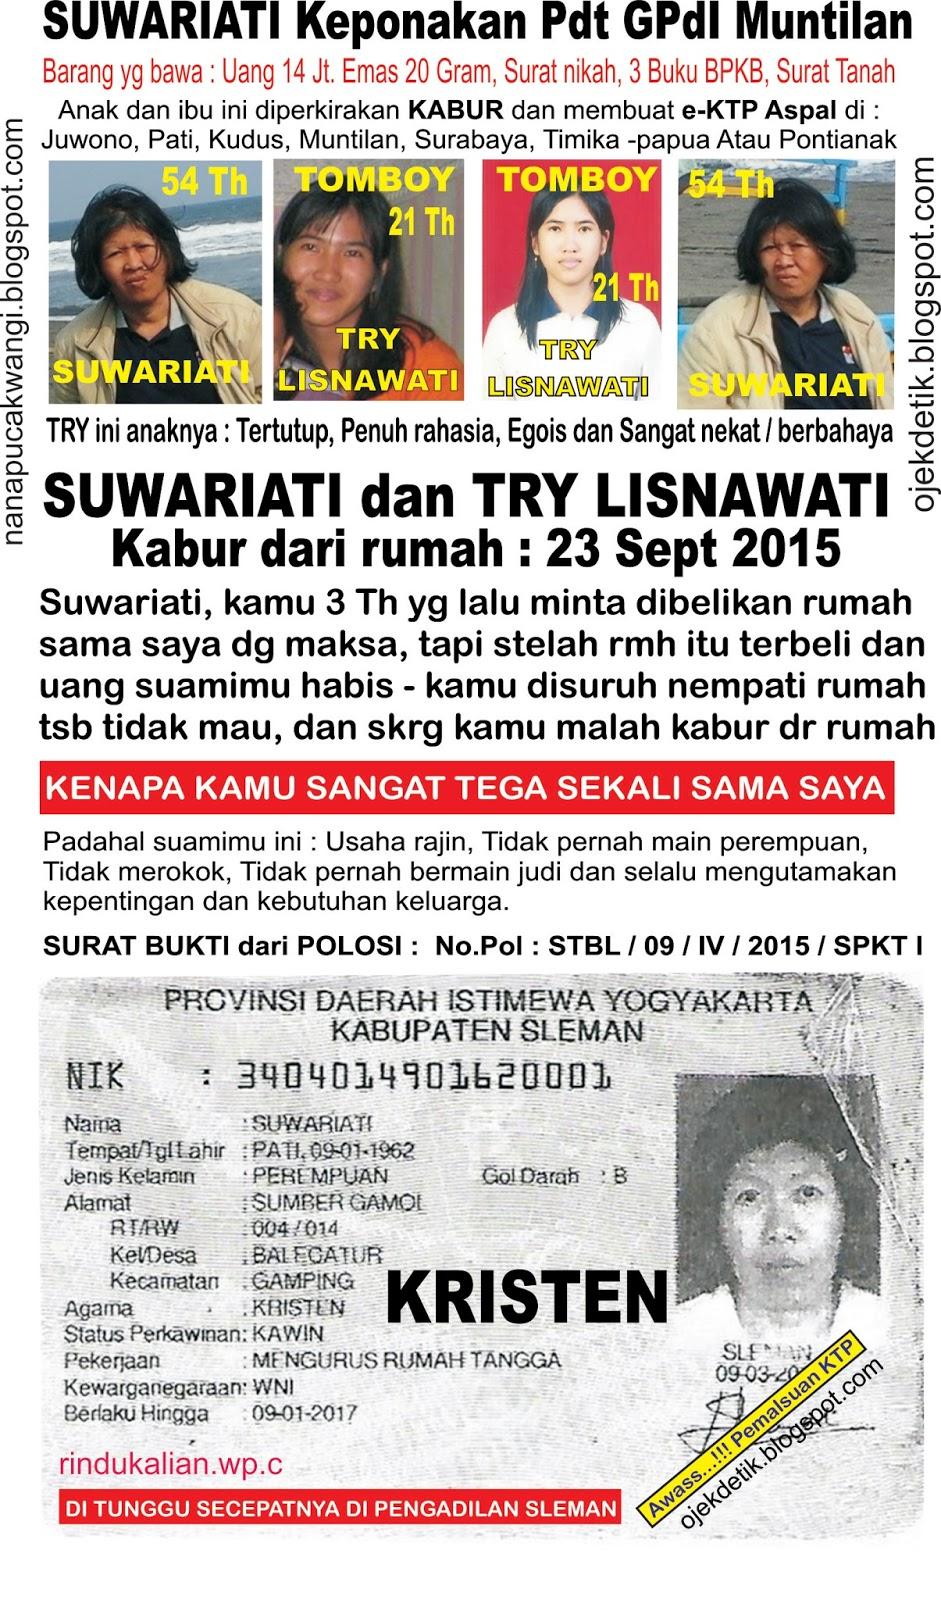 anak hilang  penculikan  e  aspal  istri kabur  ipar yg jahat  timika  surabaya